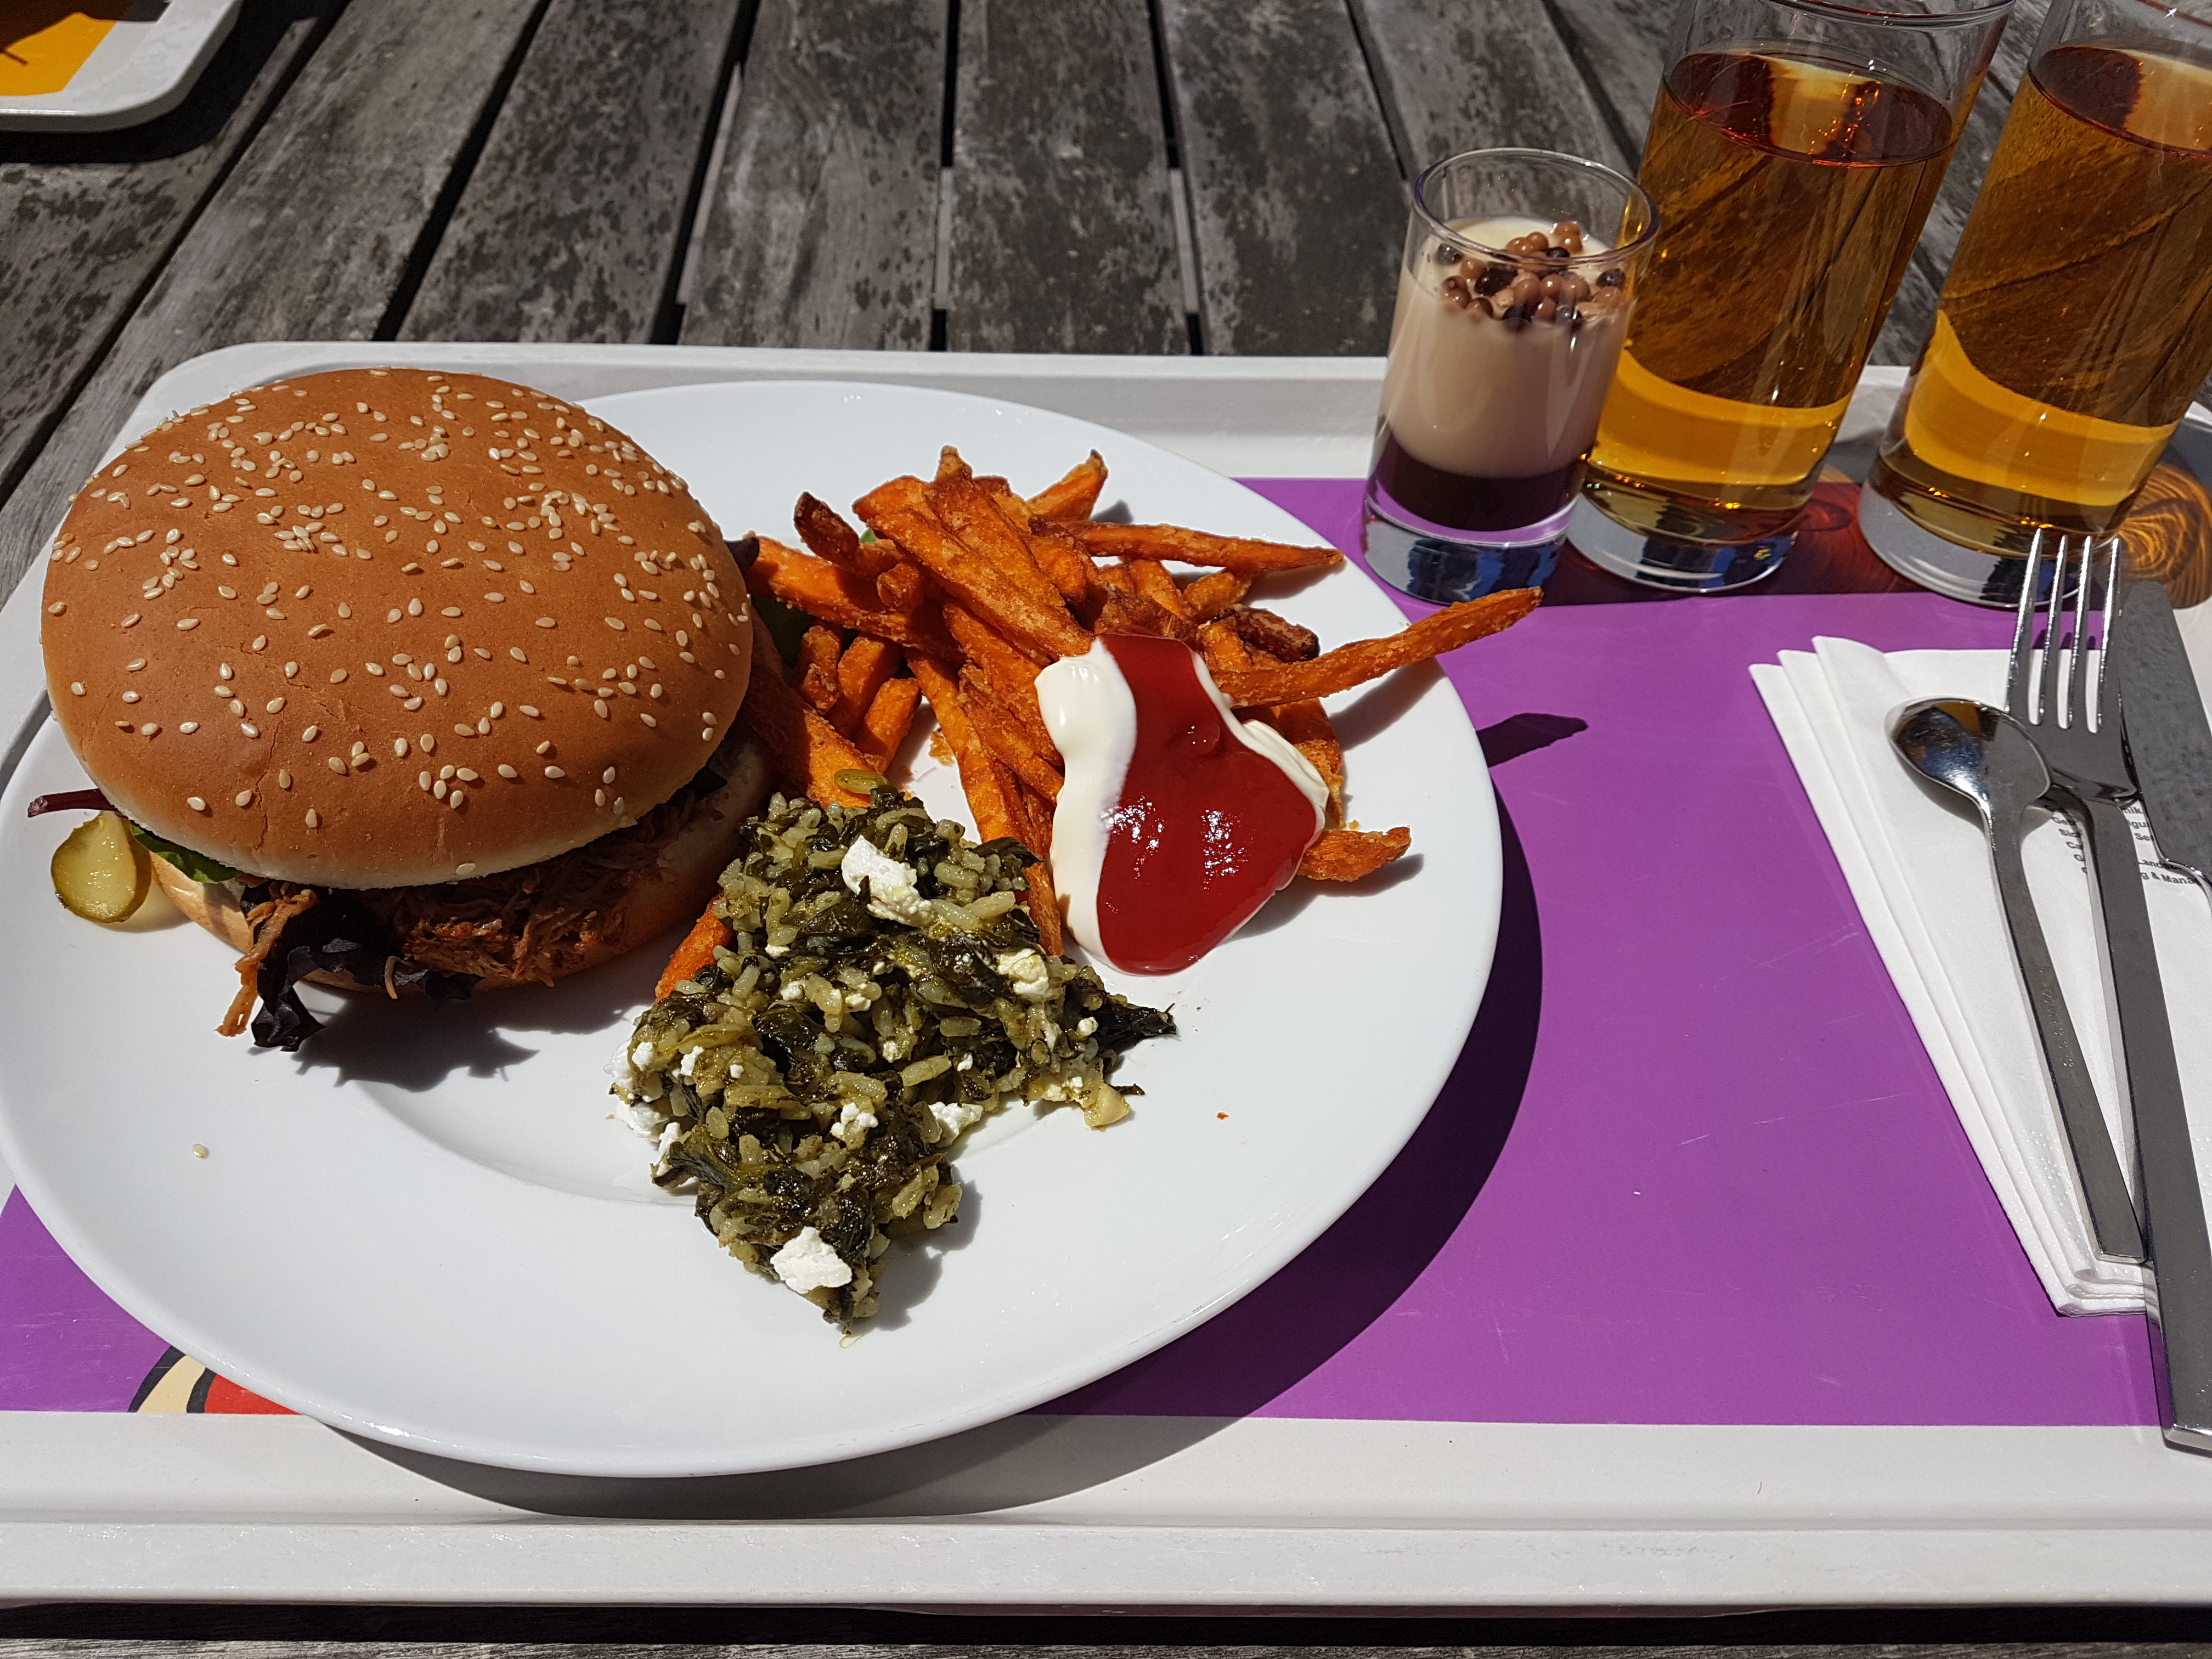 https://foodloader.net/Holz_2018-06-27_Pulled_Turkey_Burger_mit_Suesskartoffelpommes.jpg